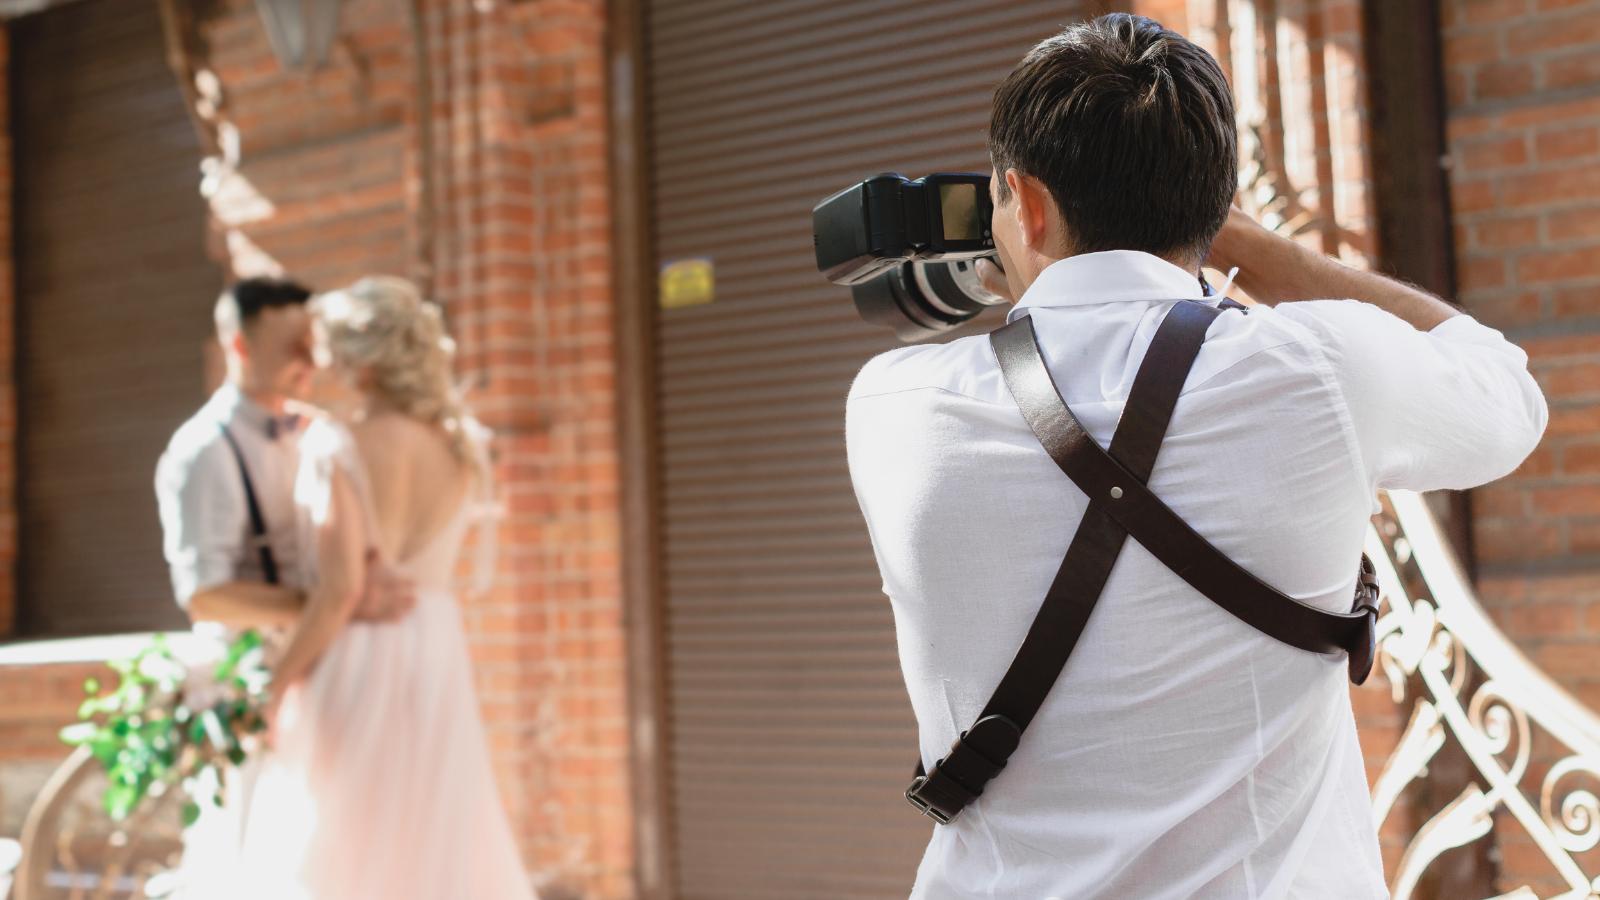 closeup of photographer taking wedding photos of bride and groom